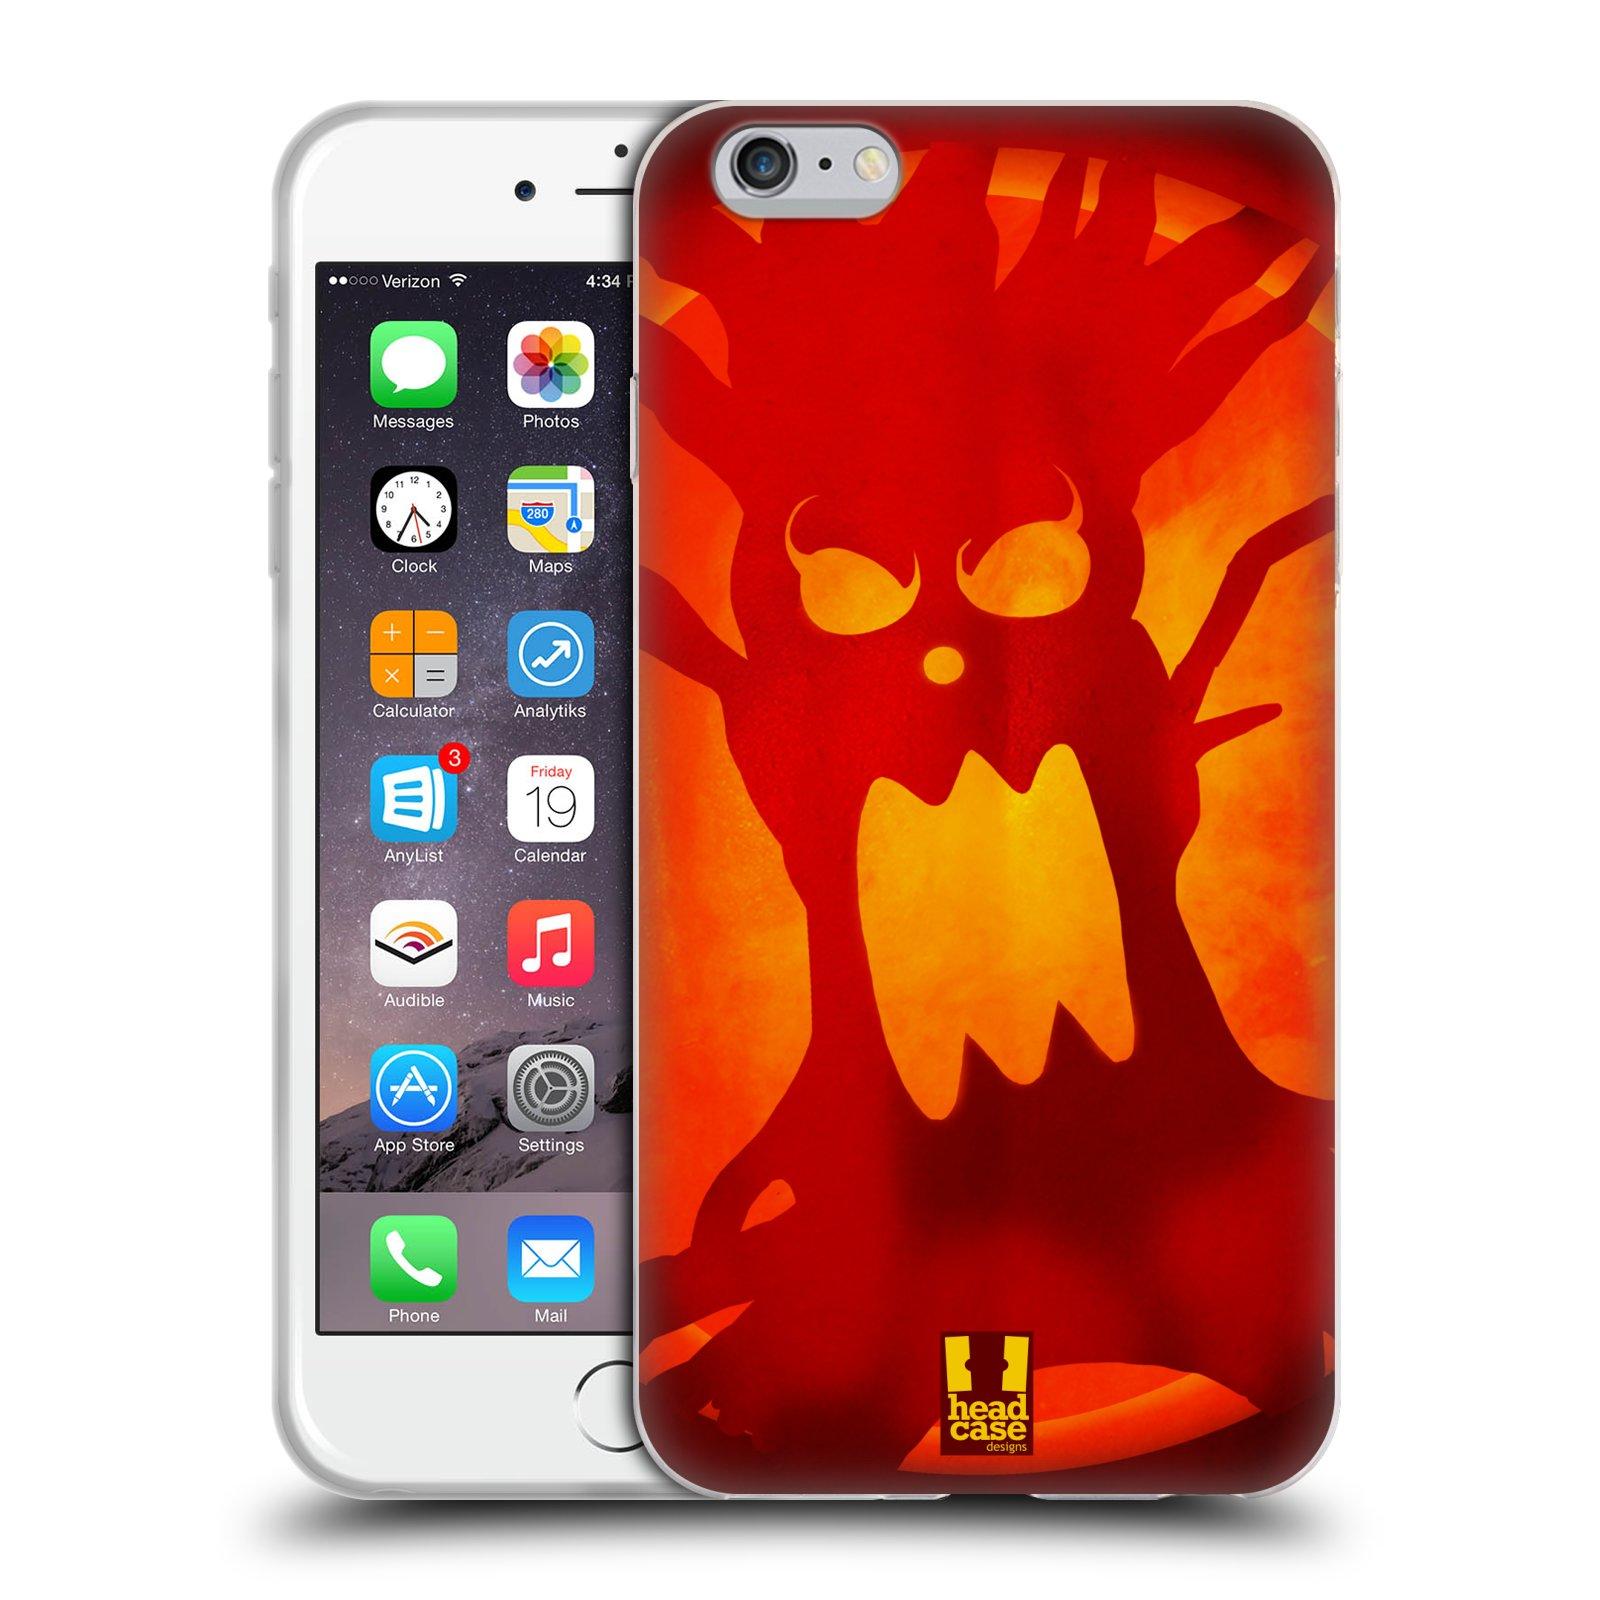 HEAD CASE silikonový obal na mobil Apple Iphone 6 PLUS/ 6S PLUS vzor odraz svítilny oranžová STRAŠIDELNÝ STROM